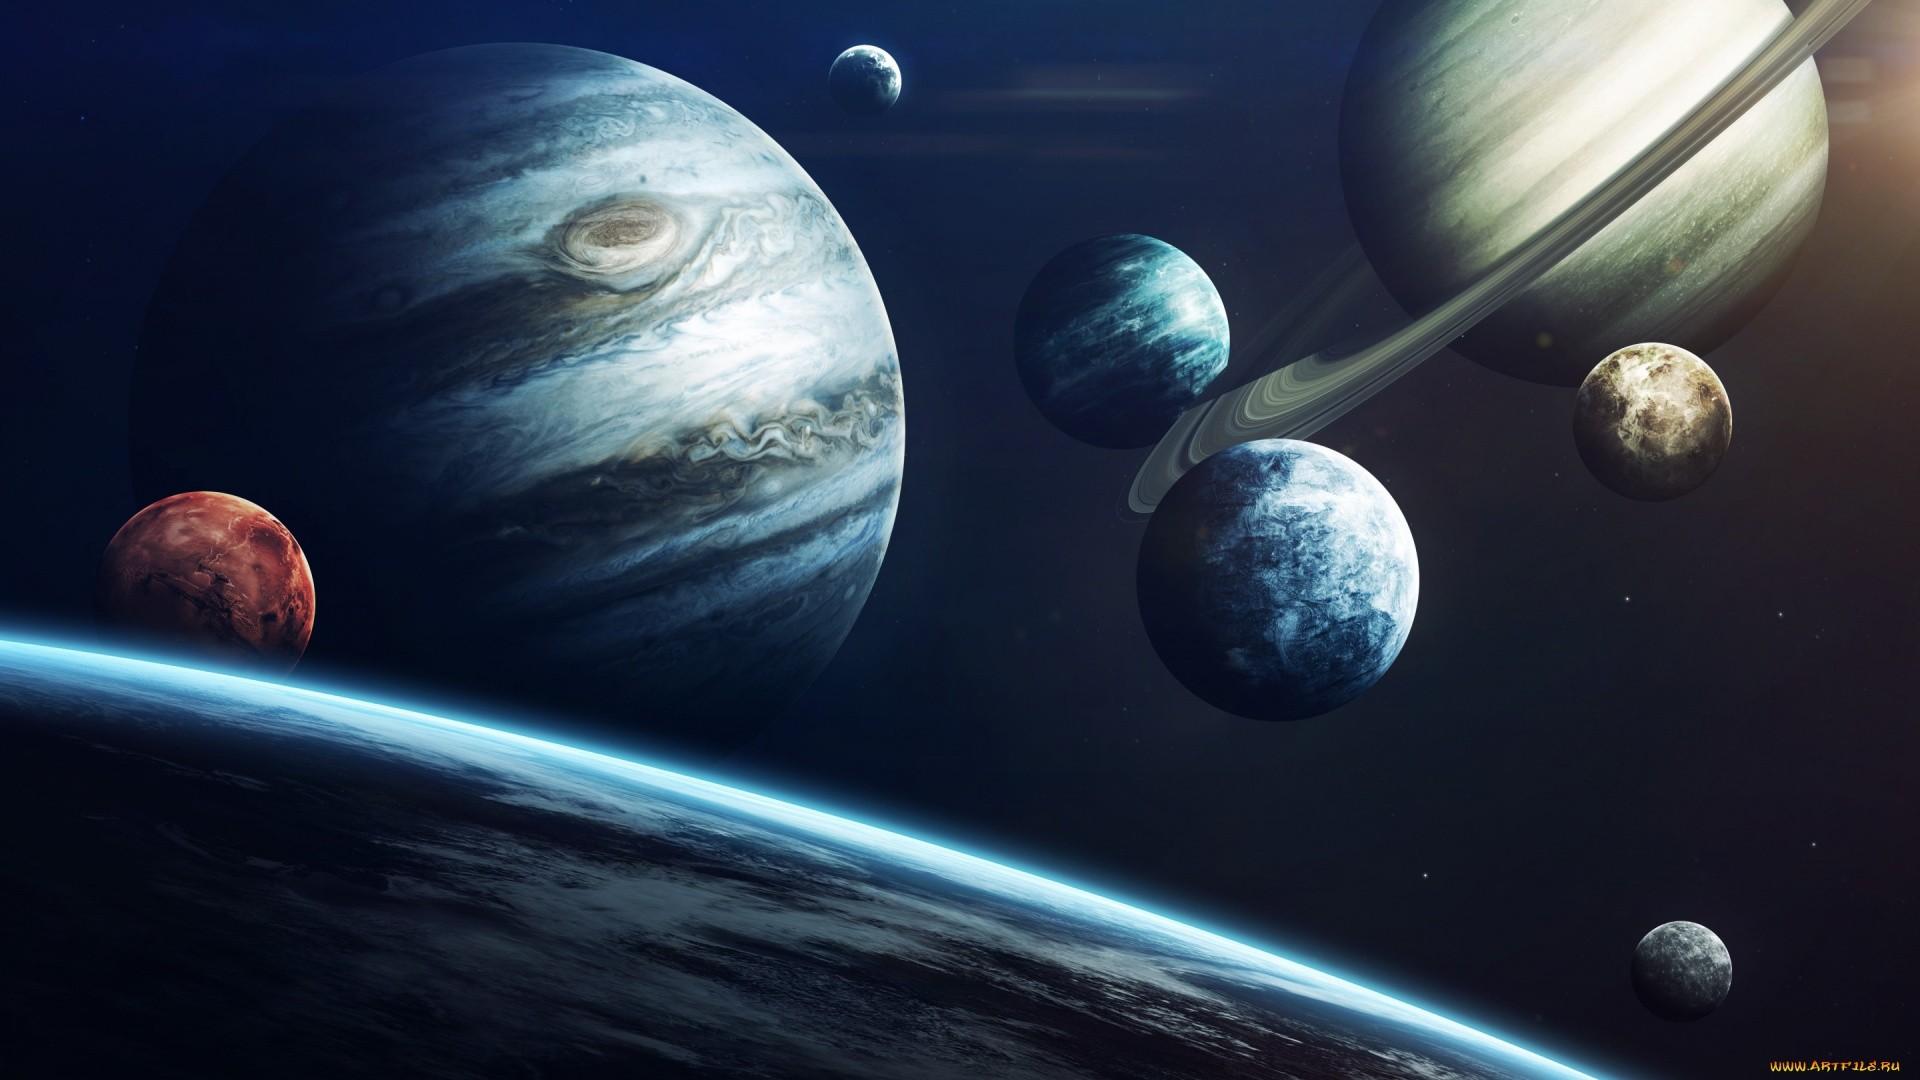 Solar System wallpaper photo hd